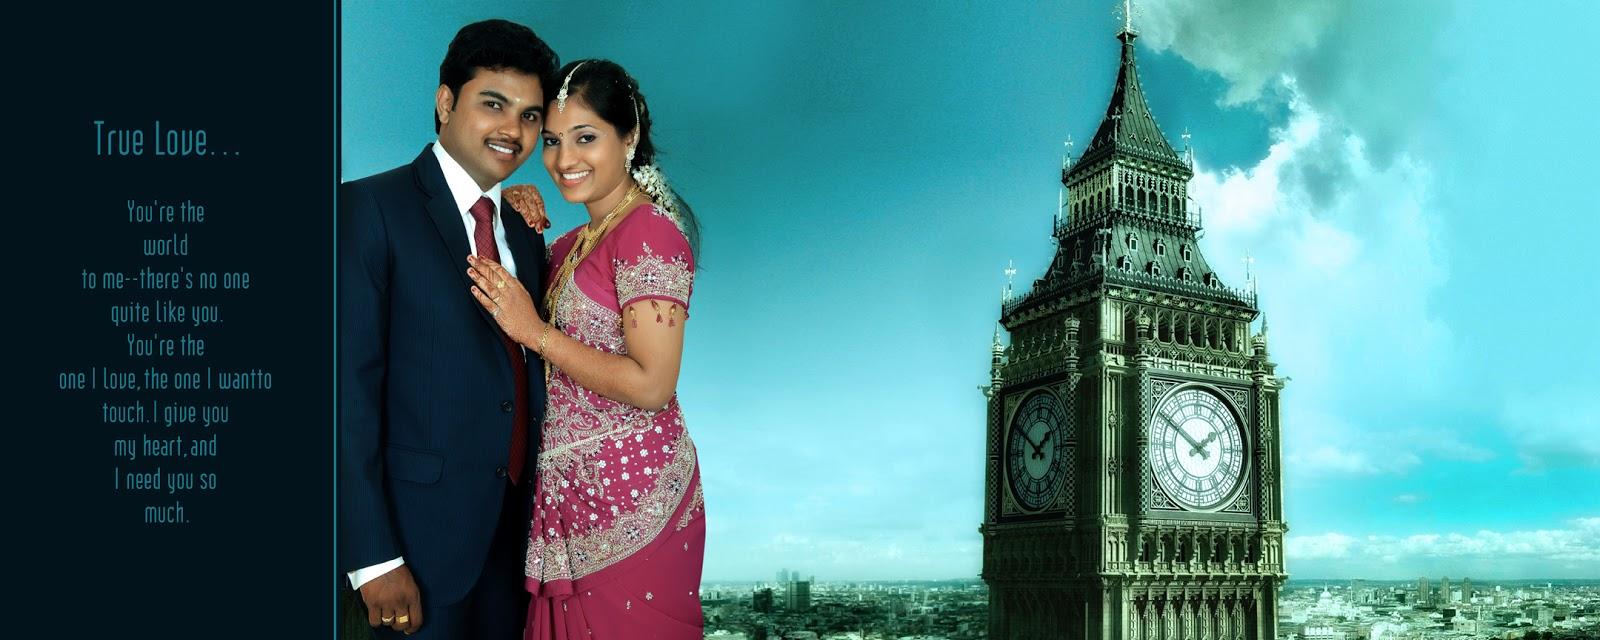 Portfolio Chennai Wedding Album Designing Service All